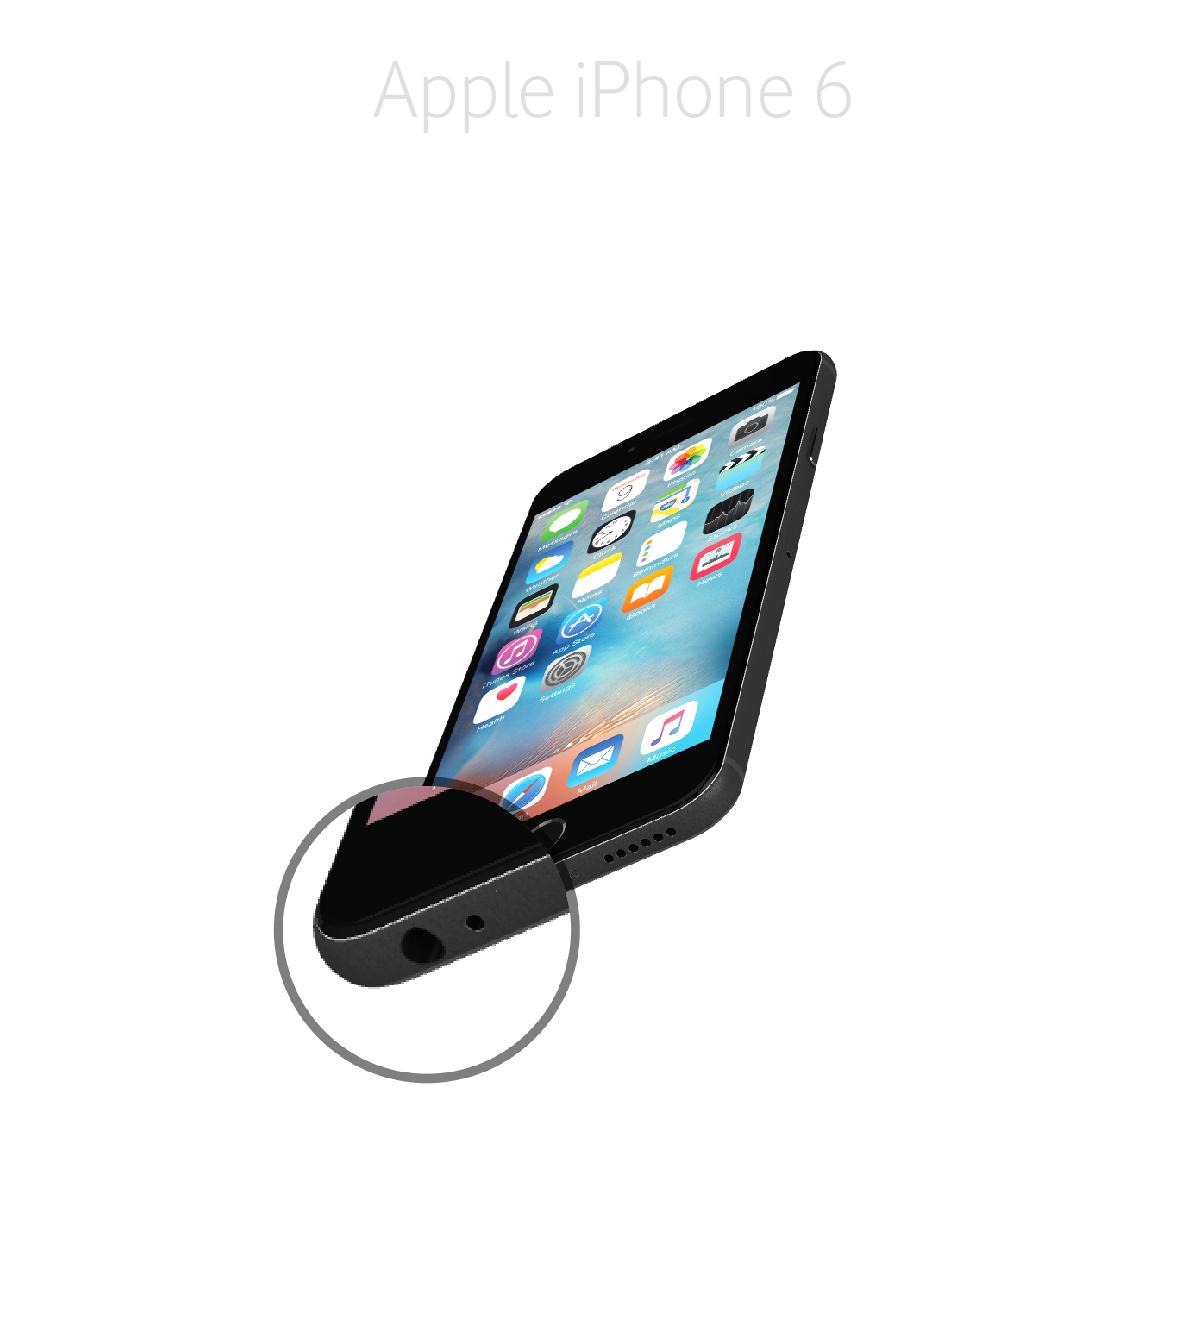 Laga mikrofon iPhone 6